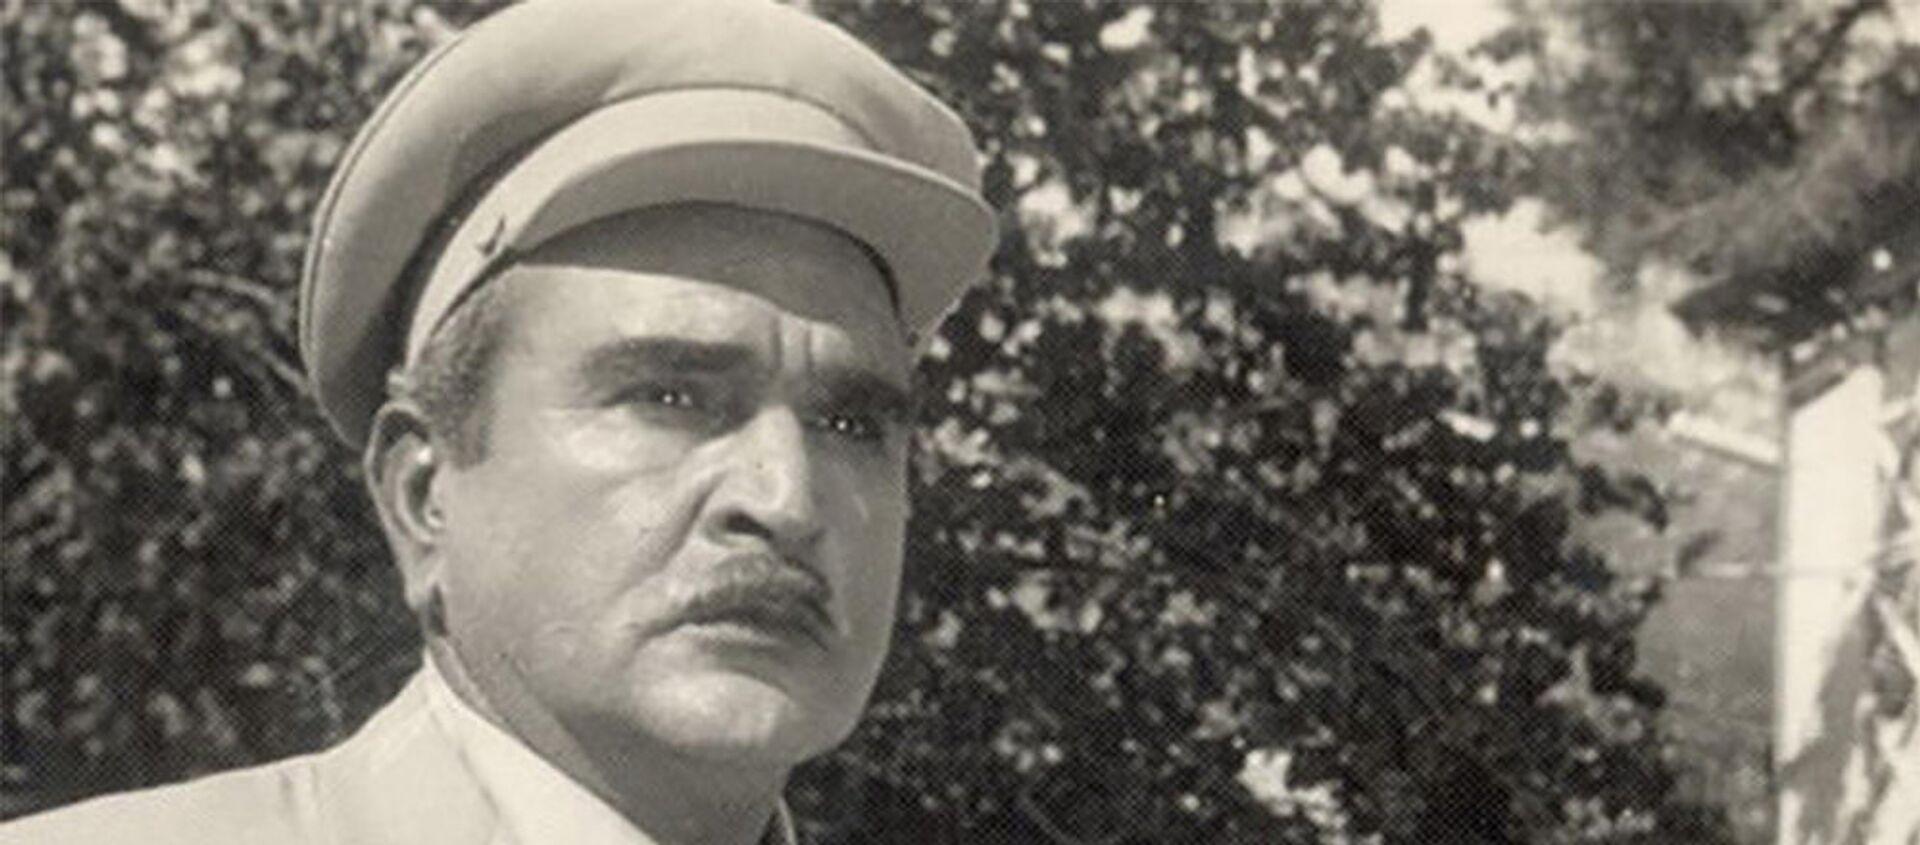 Народный артист СССР, Алескер Алекперов - Sputnik Азербайджан, 1920, 15.11.2020